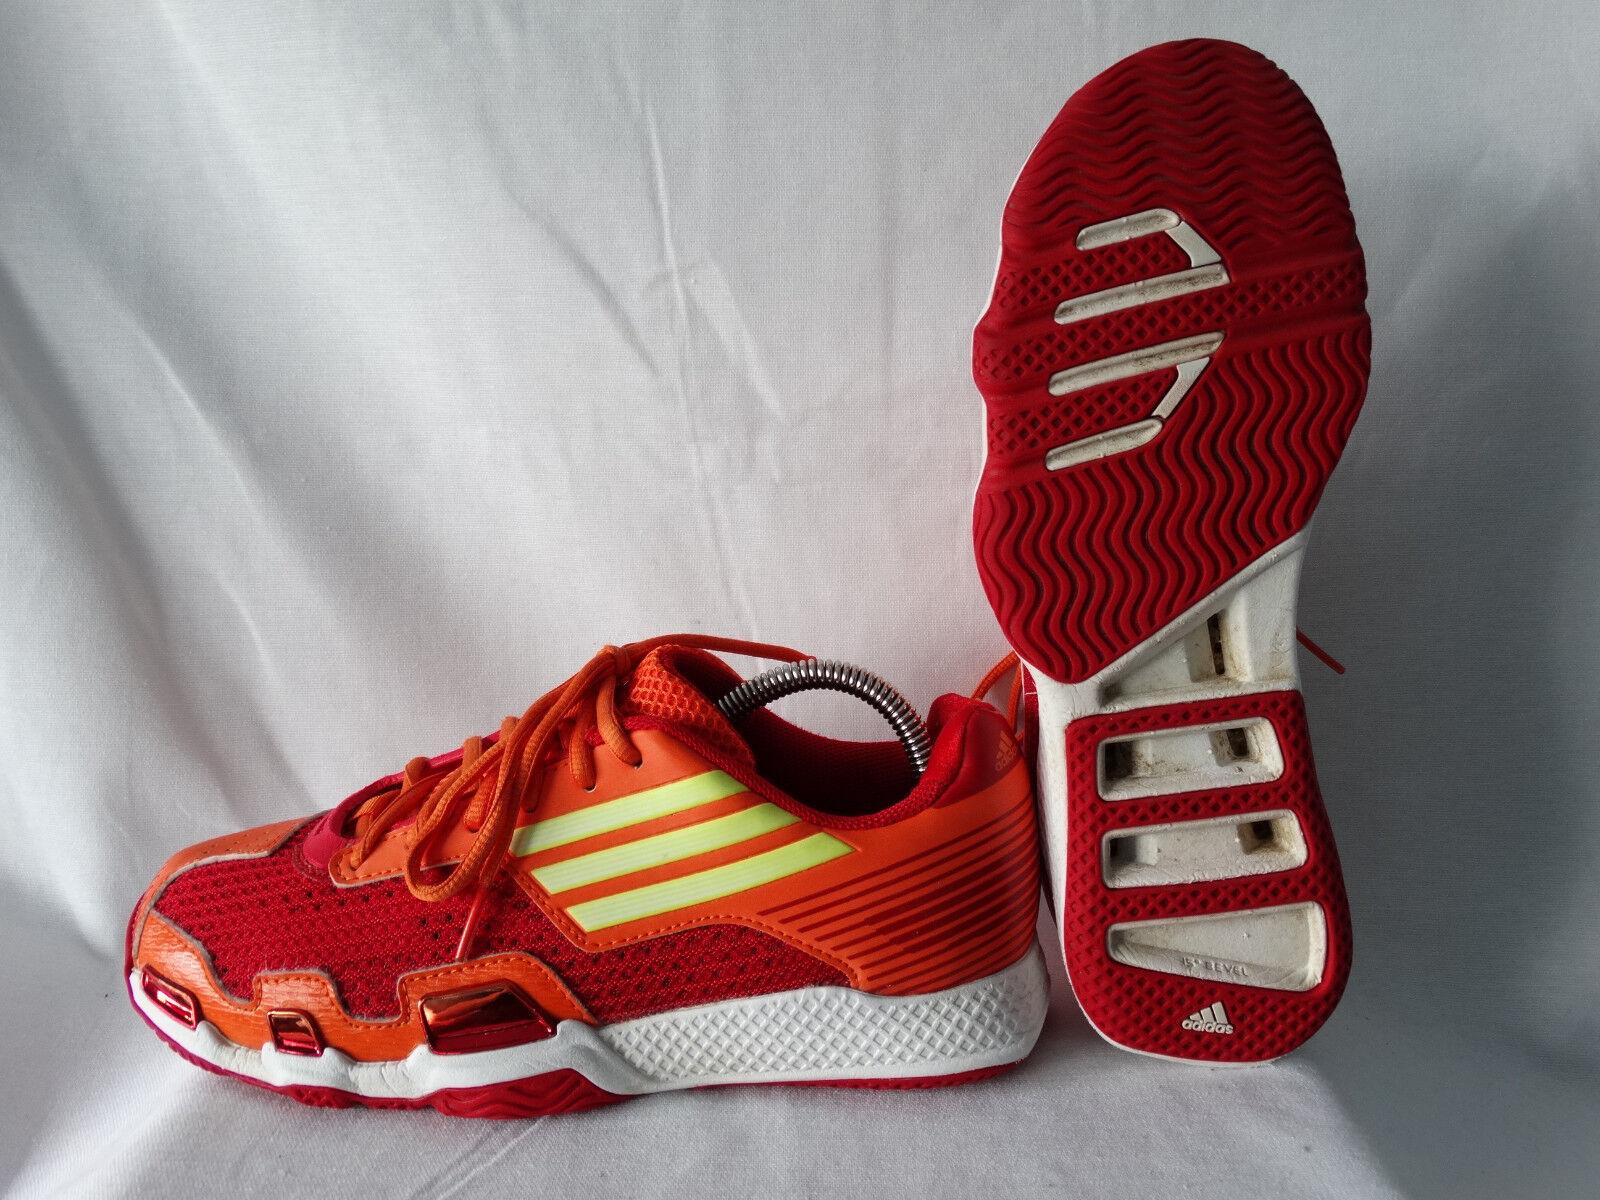 Adidas Counterblast 6 Handballschuhe M22954 Orange-gelb EU 40 UK 6,5 Moderate Kosten